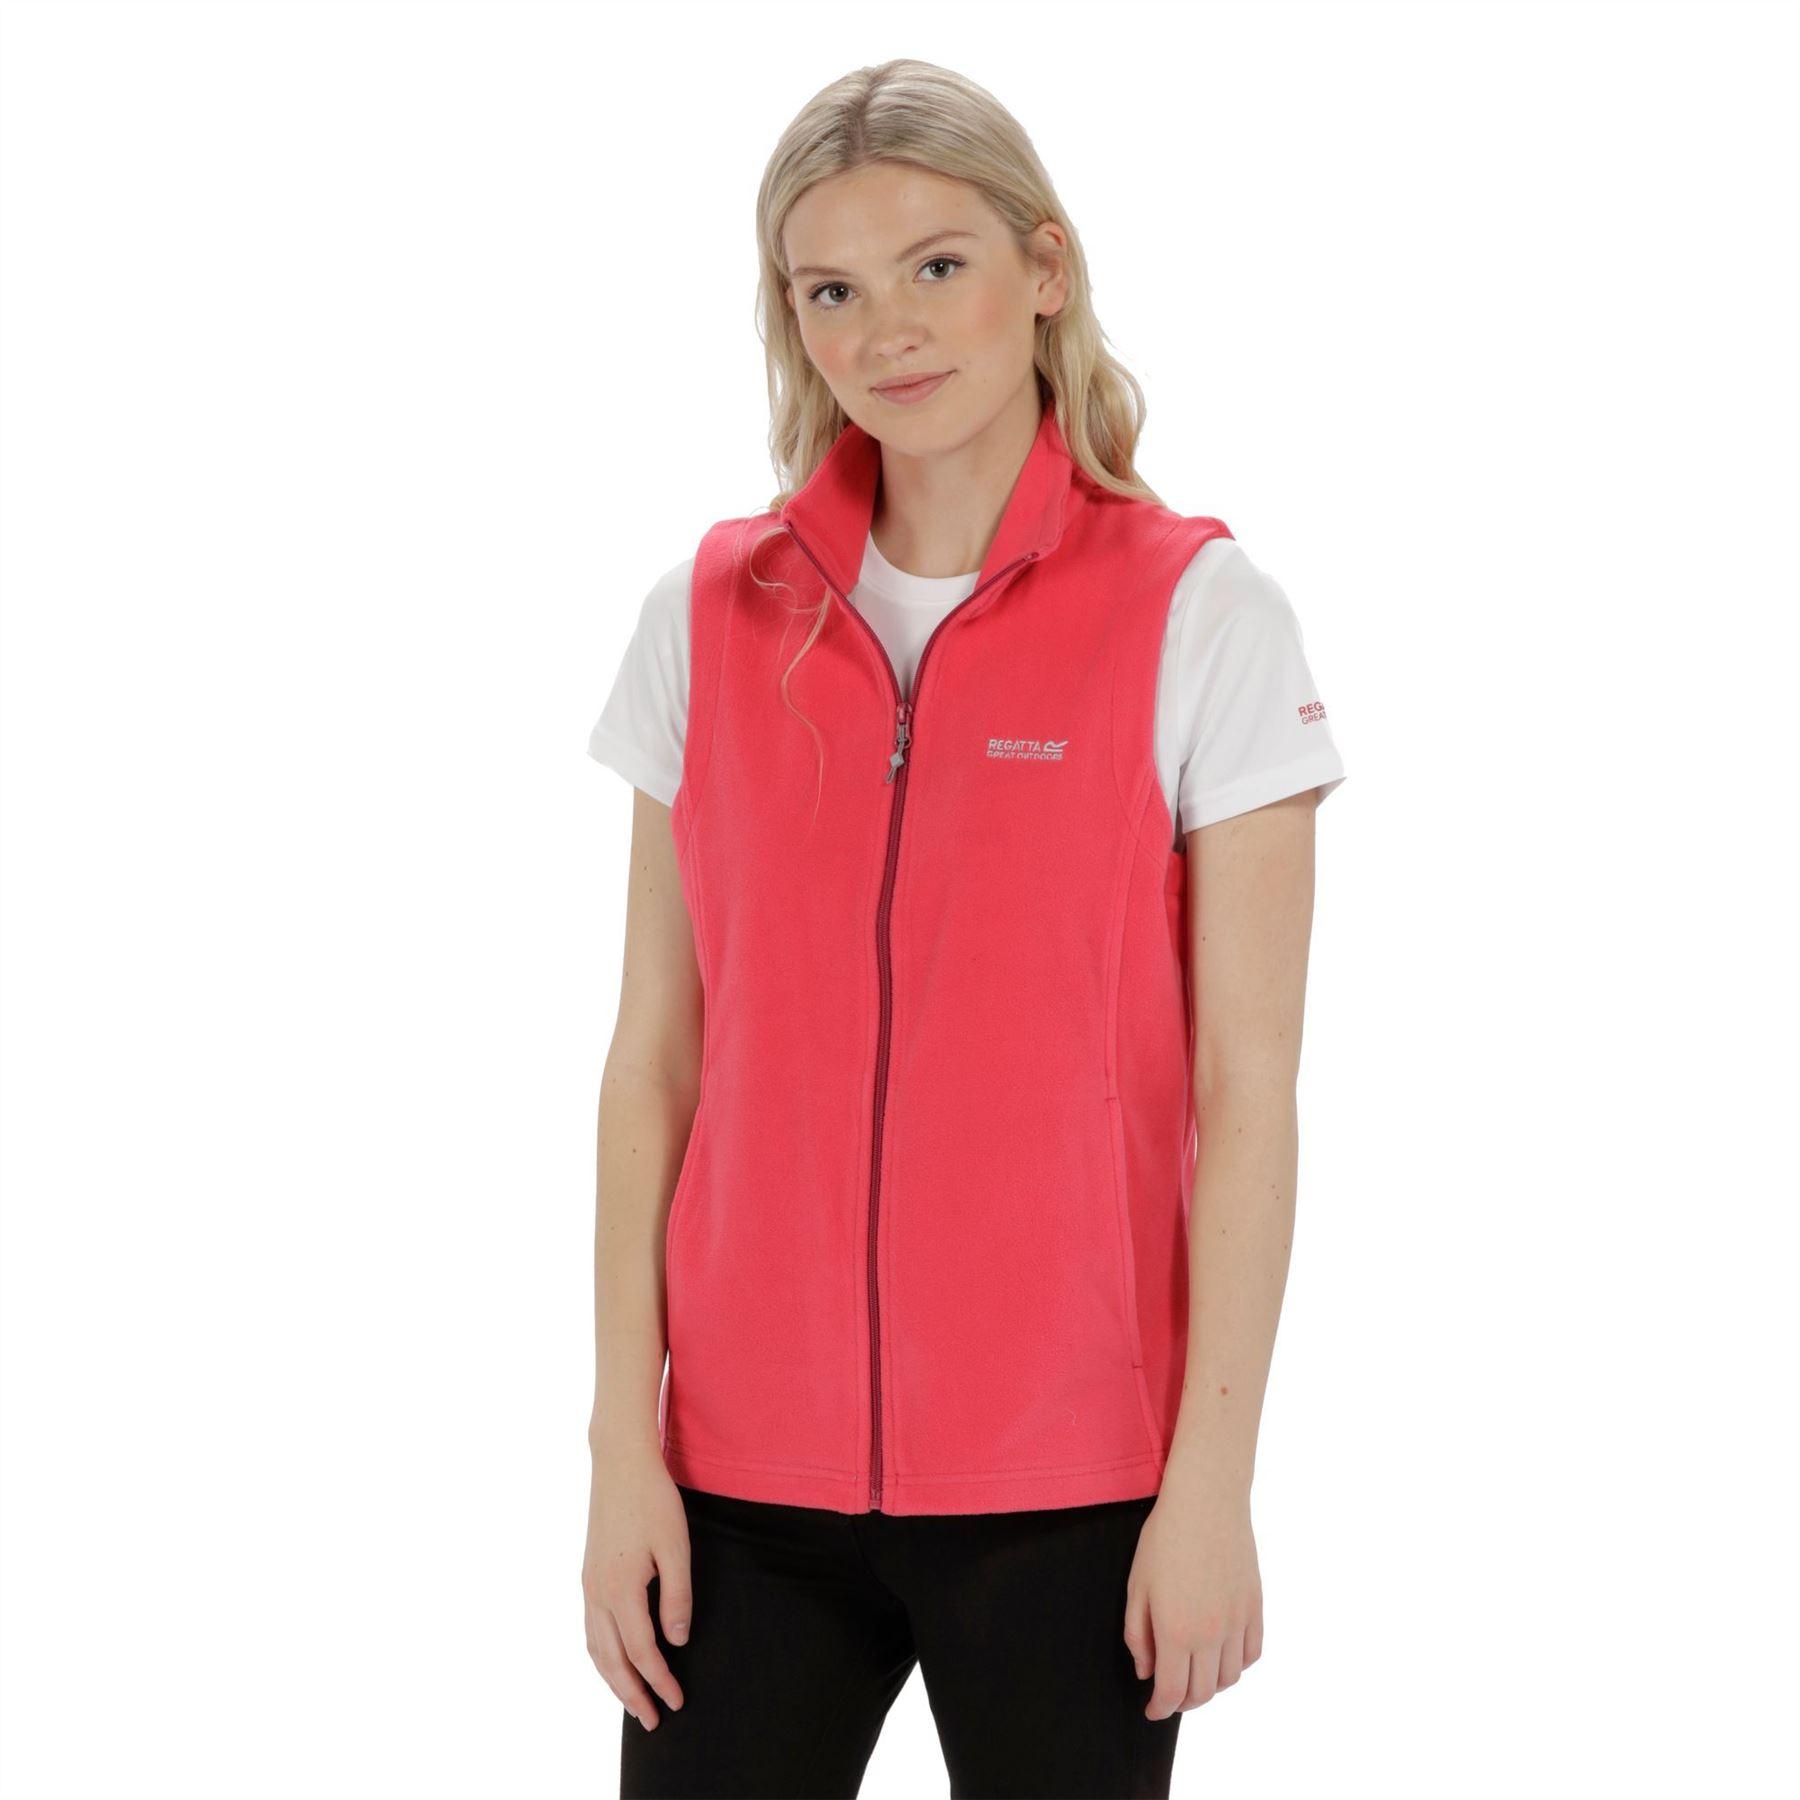 miniatuur 18 - Regatta Womens Sweetness Full Zip Micro Fleece Casual Bodywarmer Waistcoat